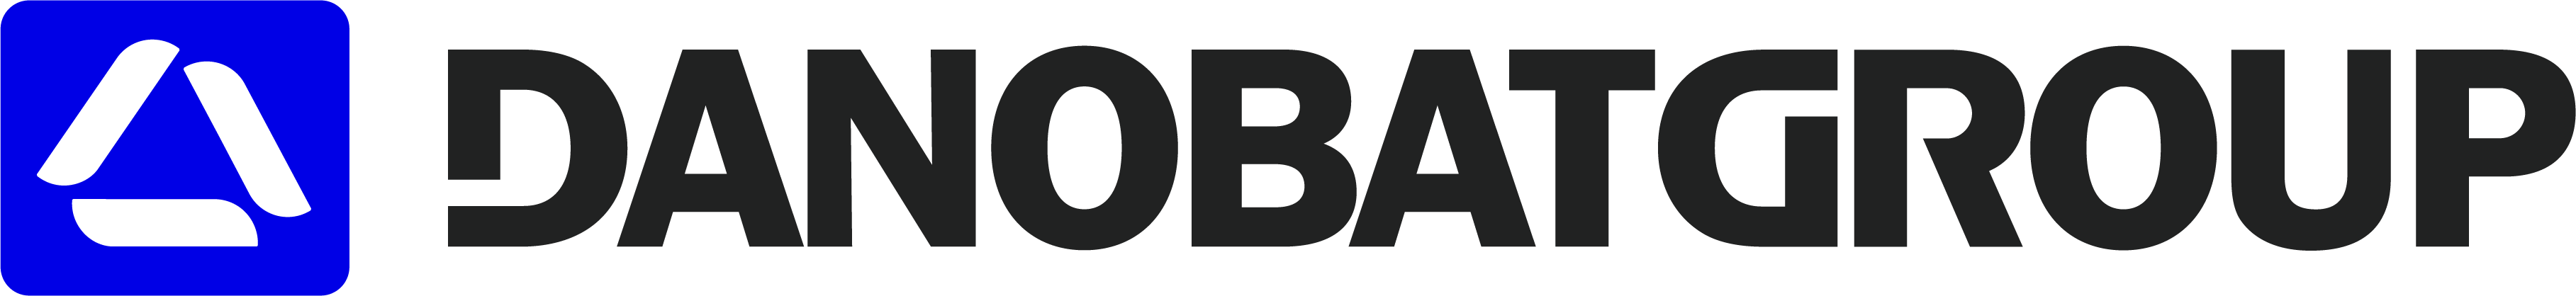 Danobat Group